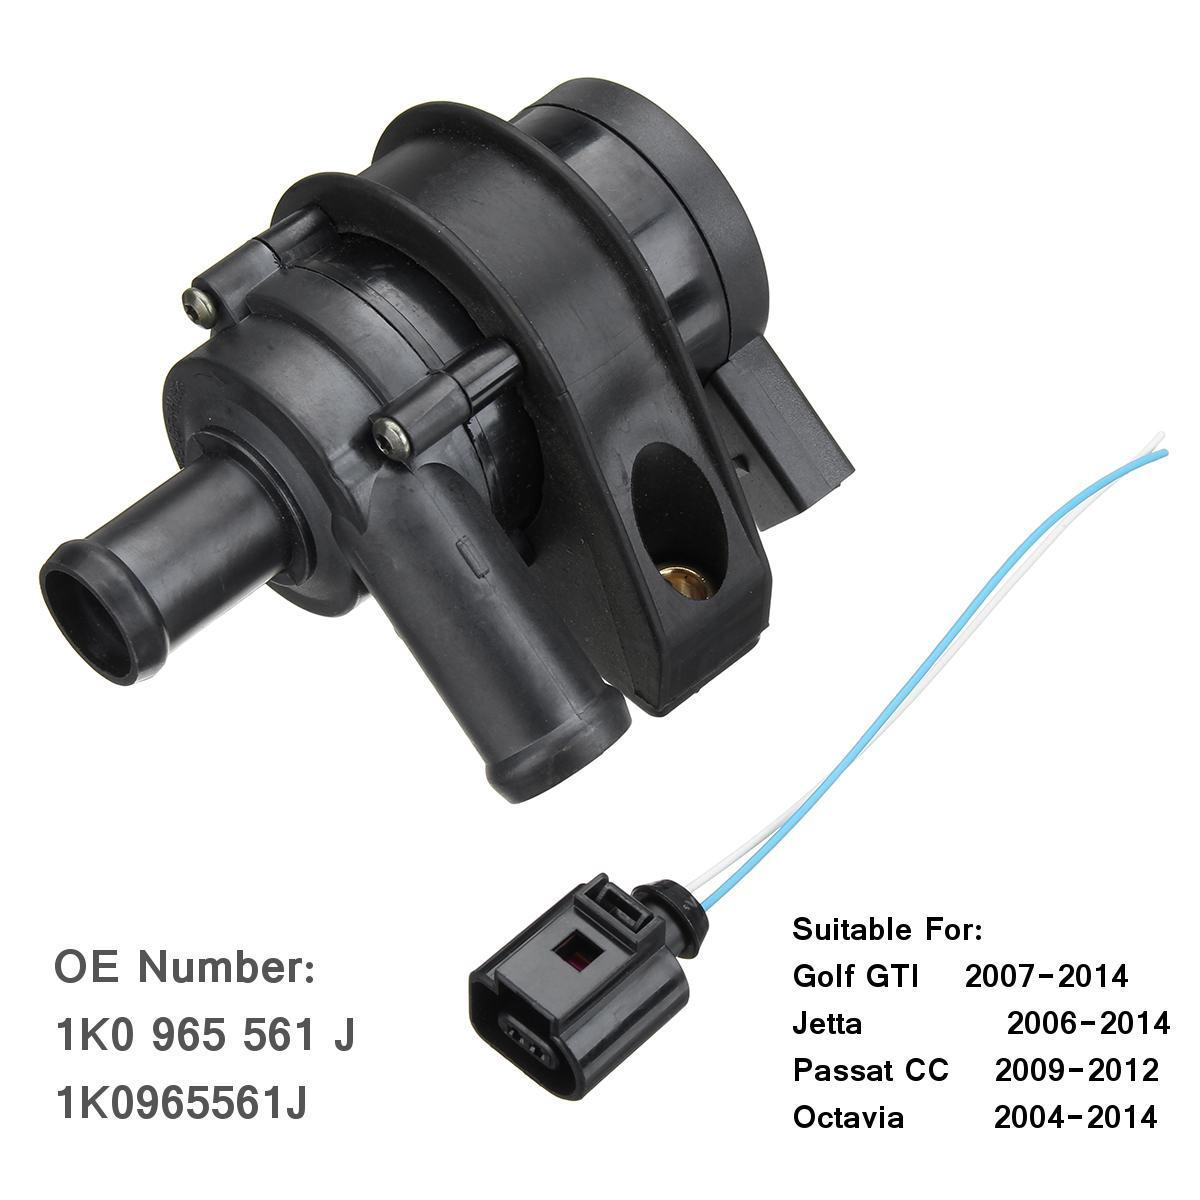 Car Engine Cooling น้ำปั๊มเชื่อมต่อปลั๊ก 1K0965561J 1K0965561G สำหรับ VW Jetta Golf GTI Passat CC Octavia 1.8 T 2.0 T 12 V